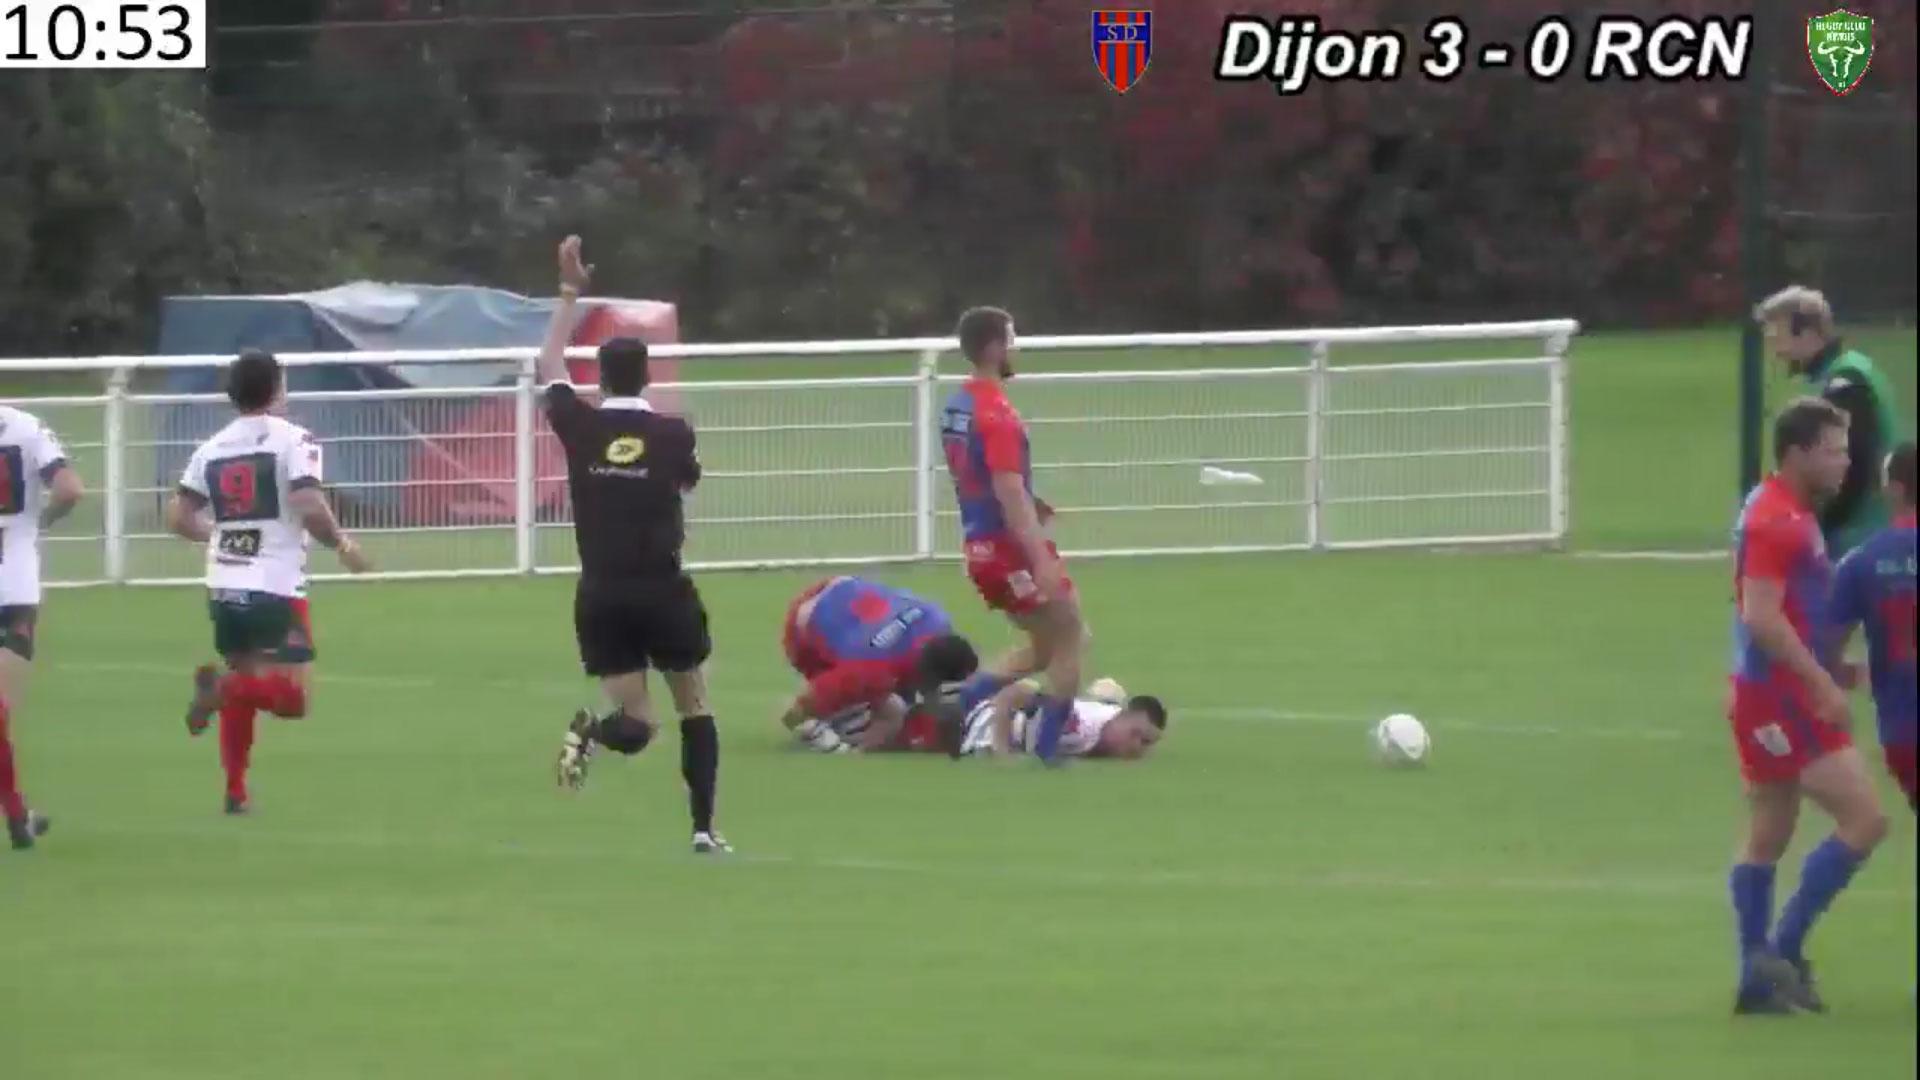 Fédérale 1 : Dijon / RC Nîmes 8/10/2017